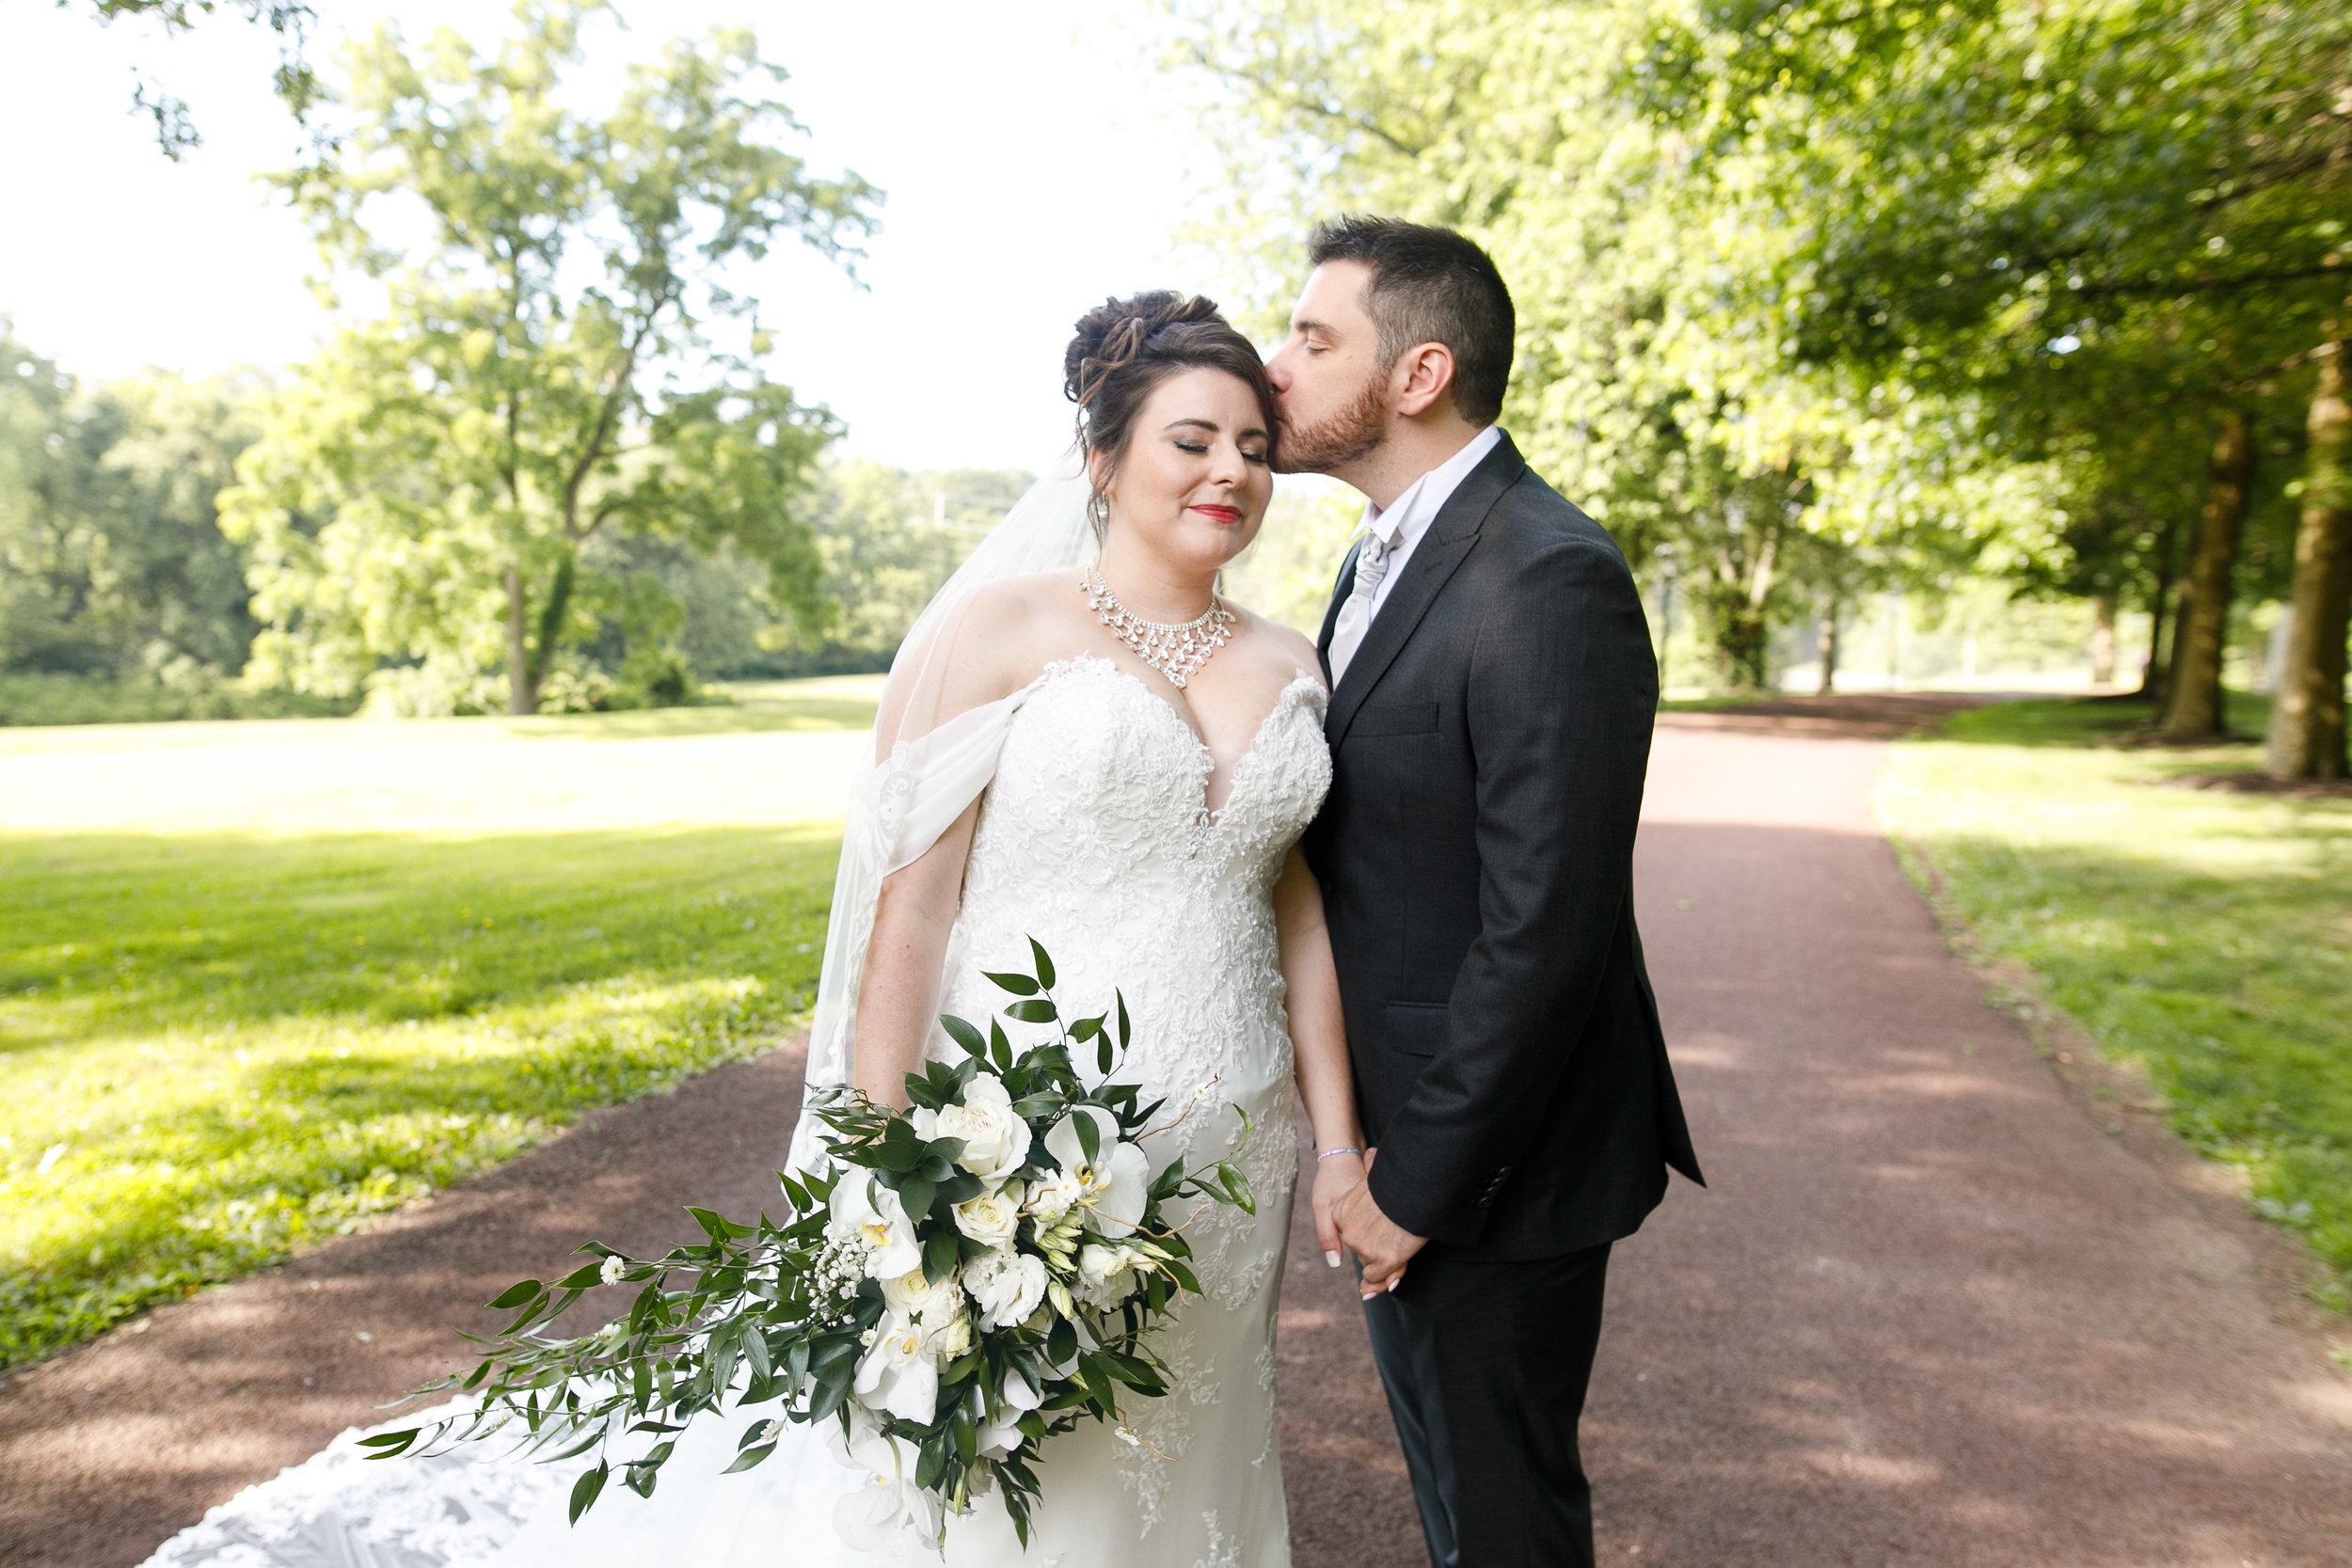 Wedding at Joseph Ambler In Bucks County PA7.jpg